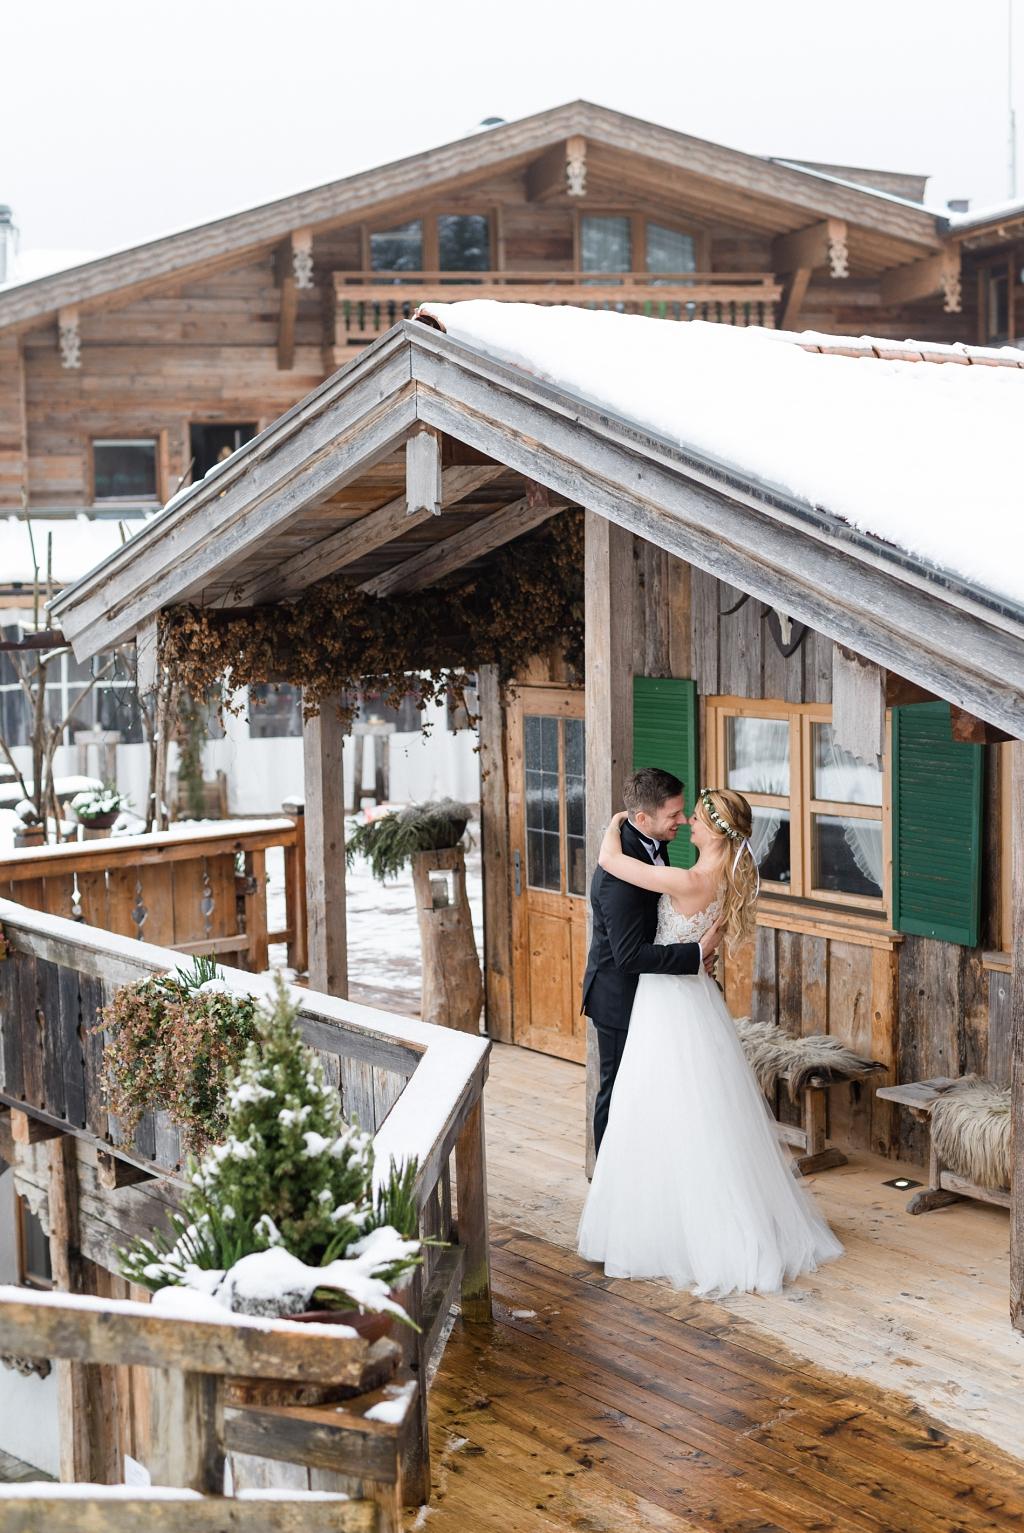 Hochzeit im Winter am Tatzlwurm